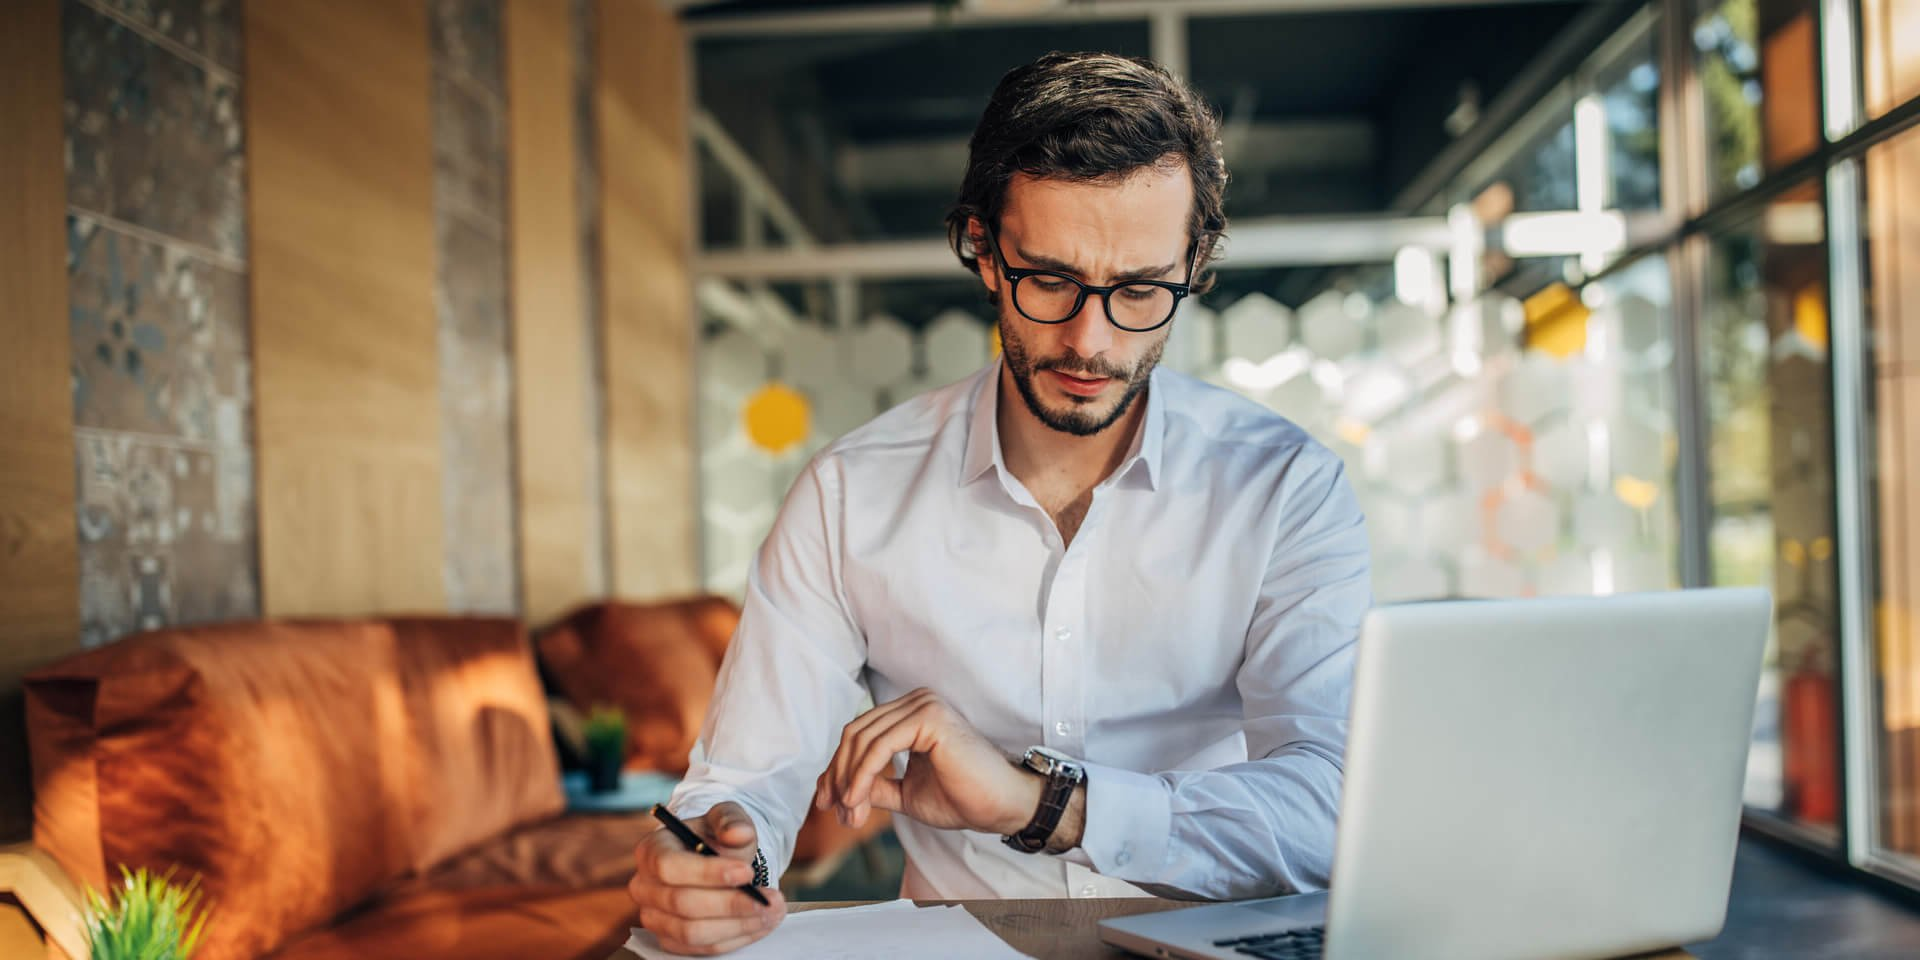 three factors affecting employee productivity